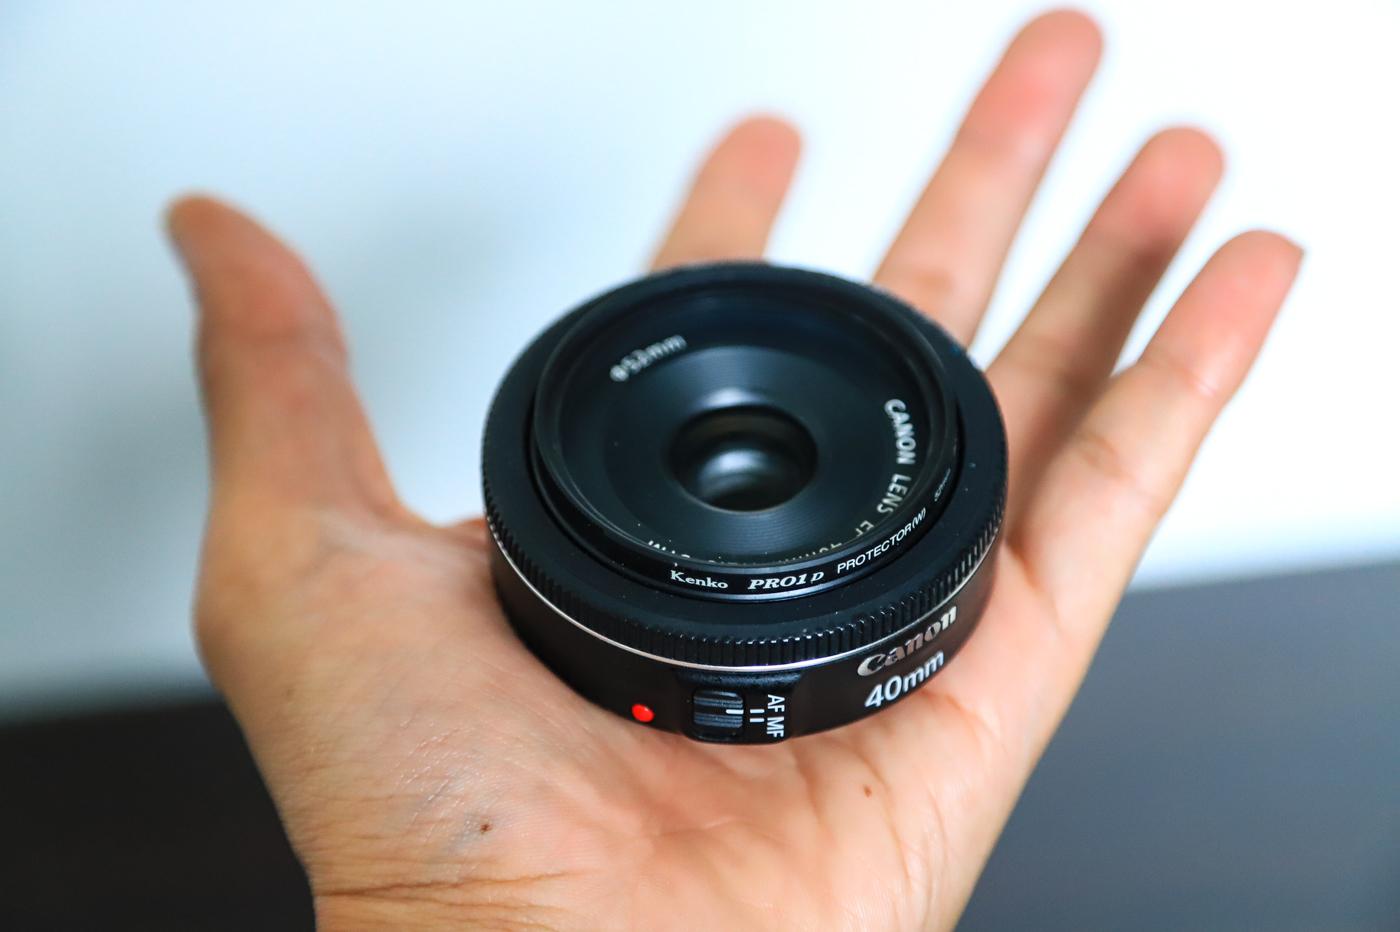 canon40mm-15.jpg